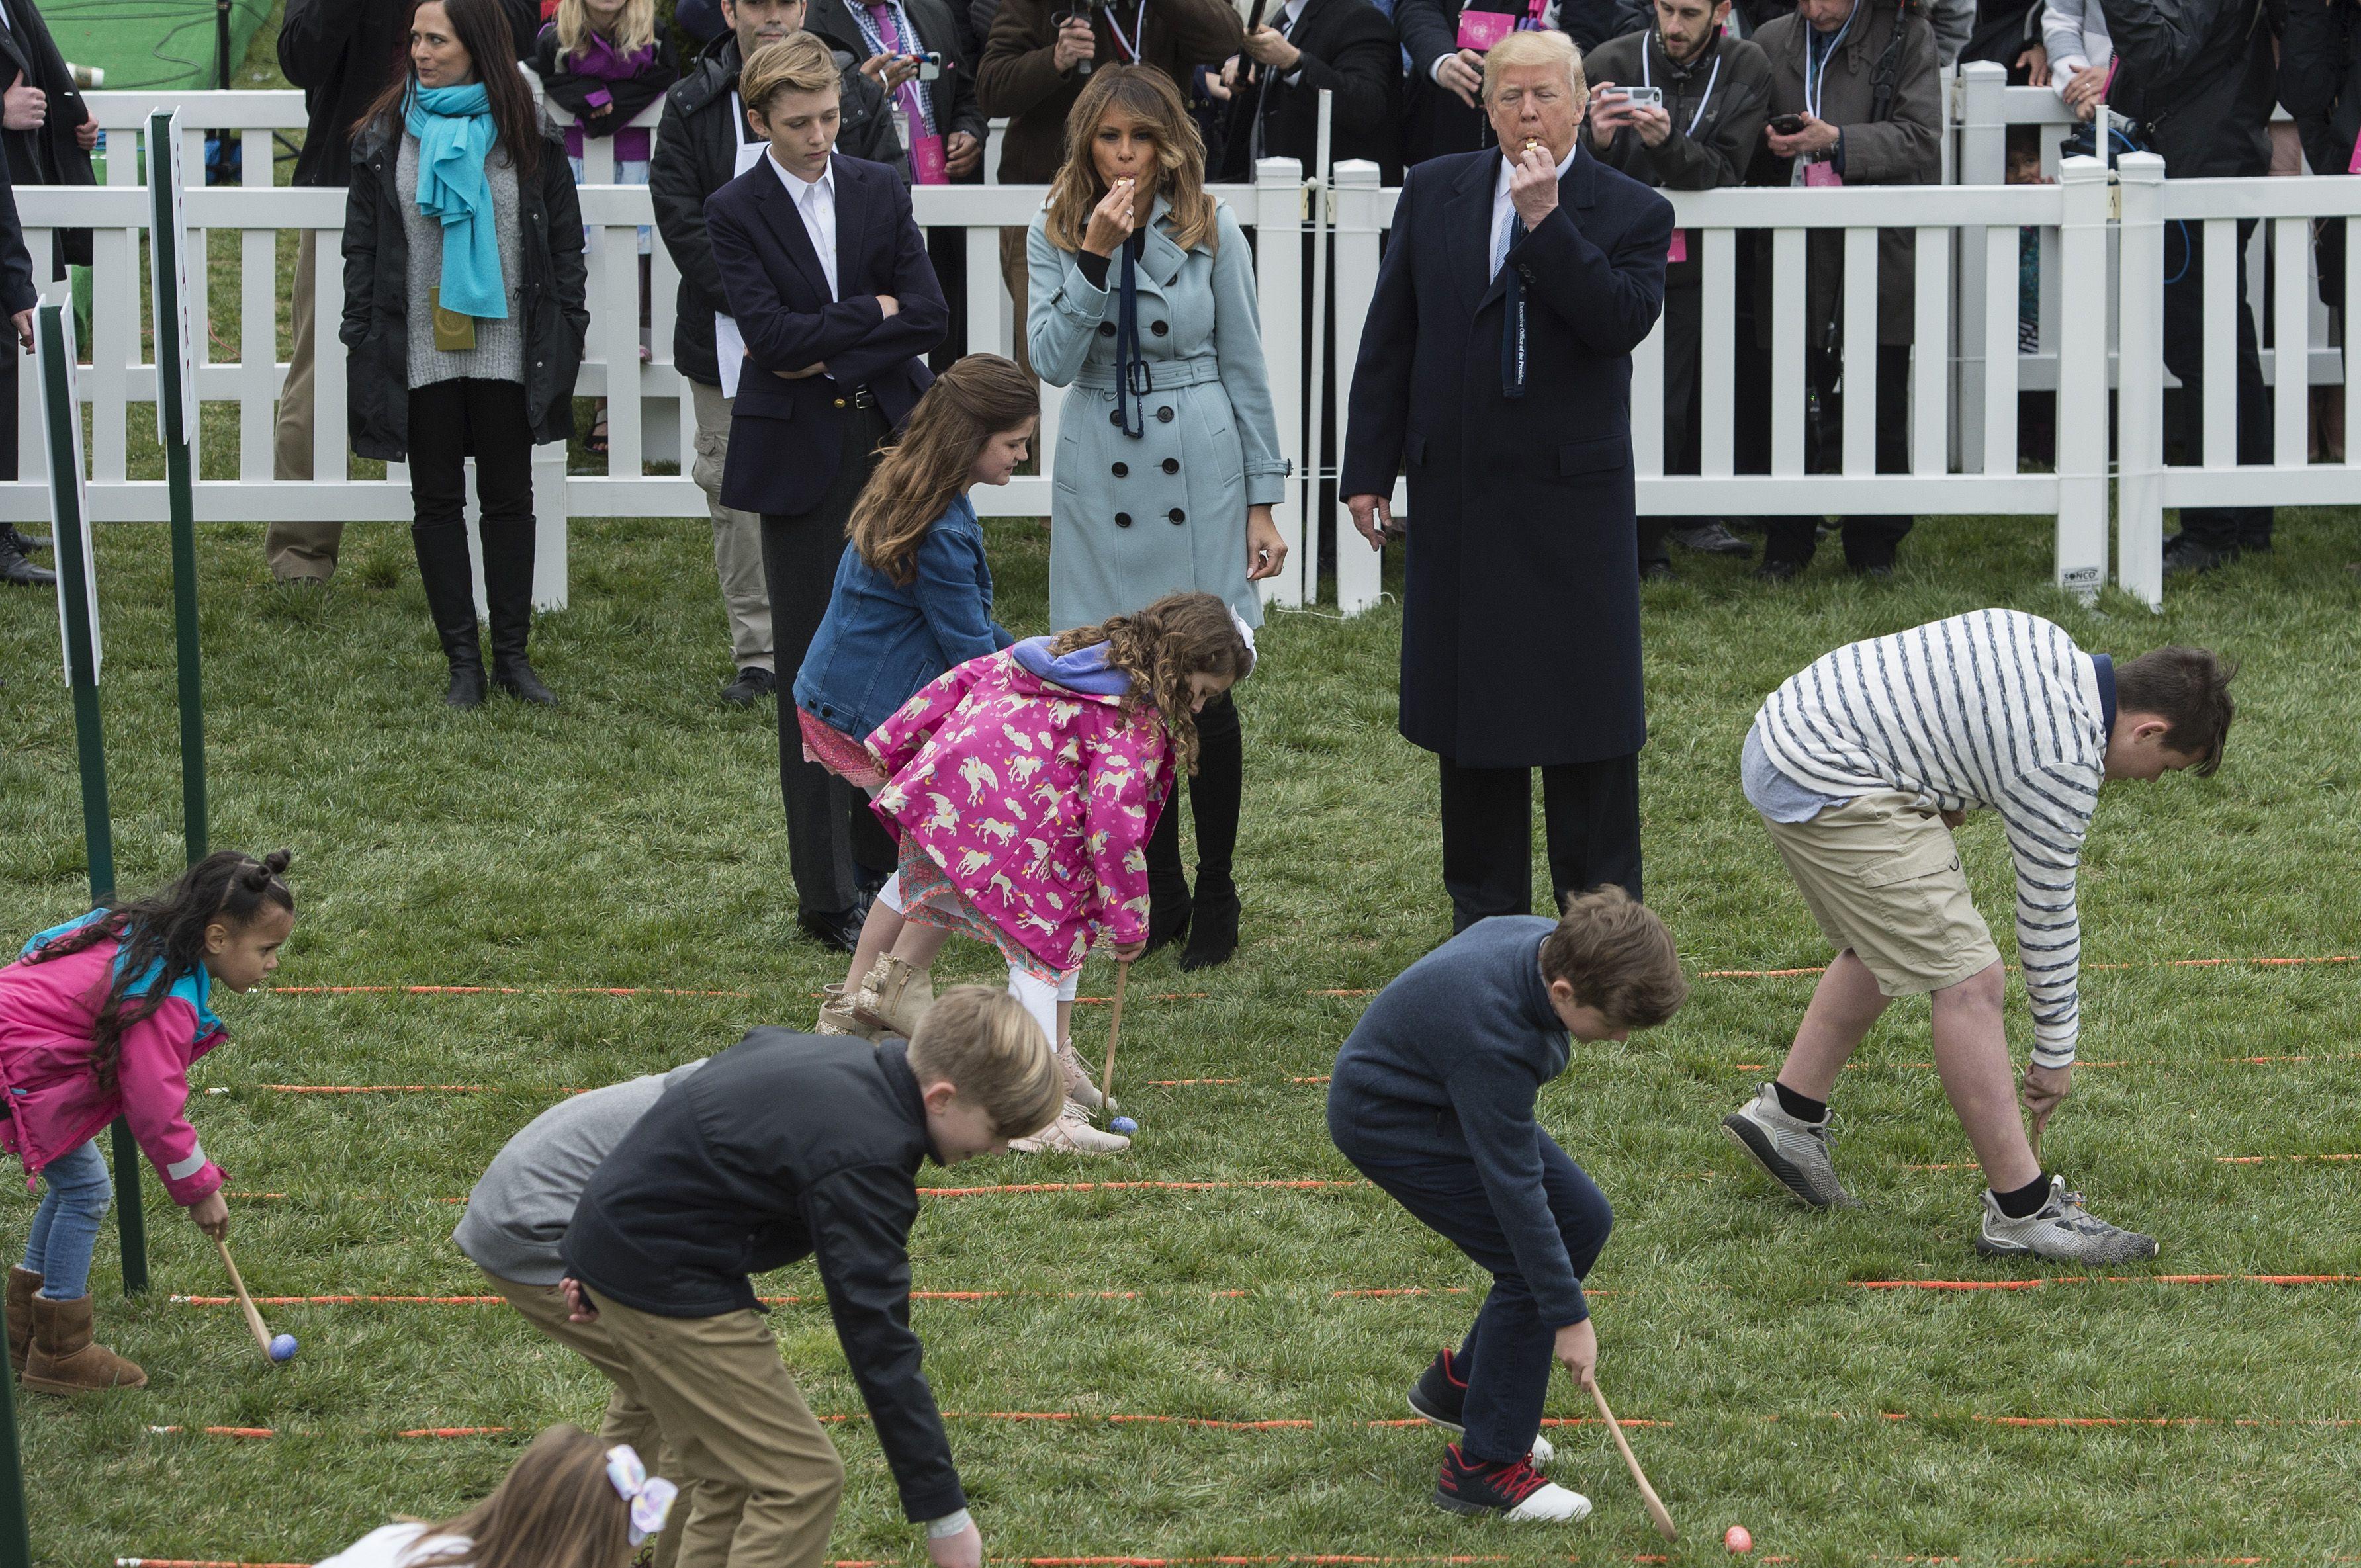 Children scooping eggs